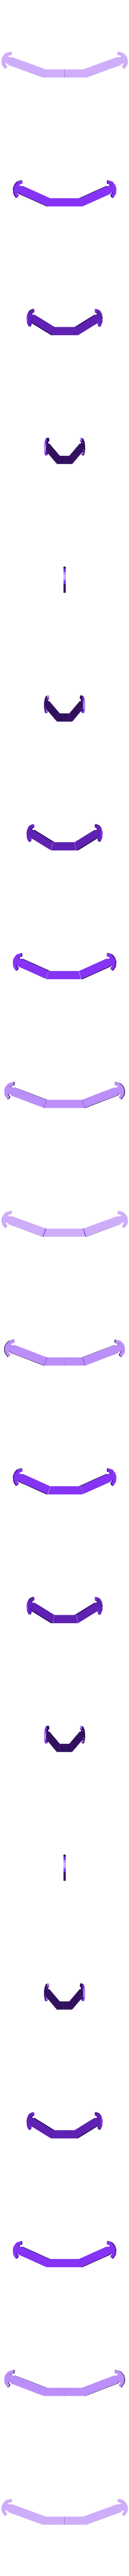 CCR10_correa mascarilla v5.obj Download free OBJ file one-size-fits-all mask attachment • 3D printable design, eduardojcch